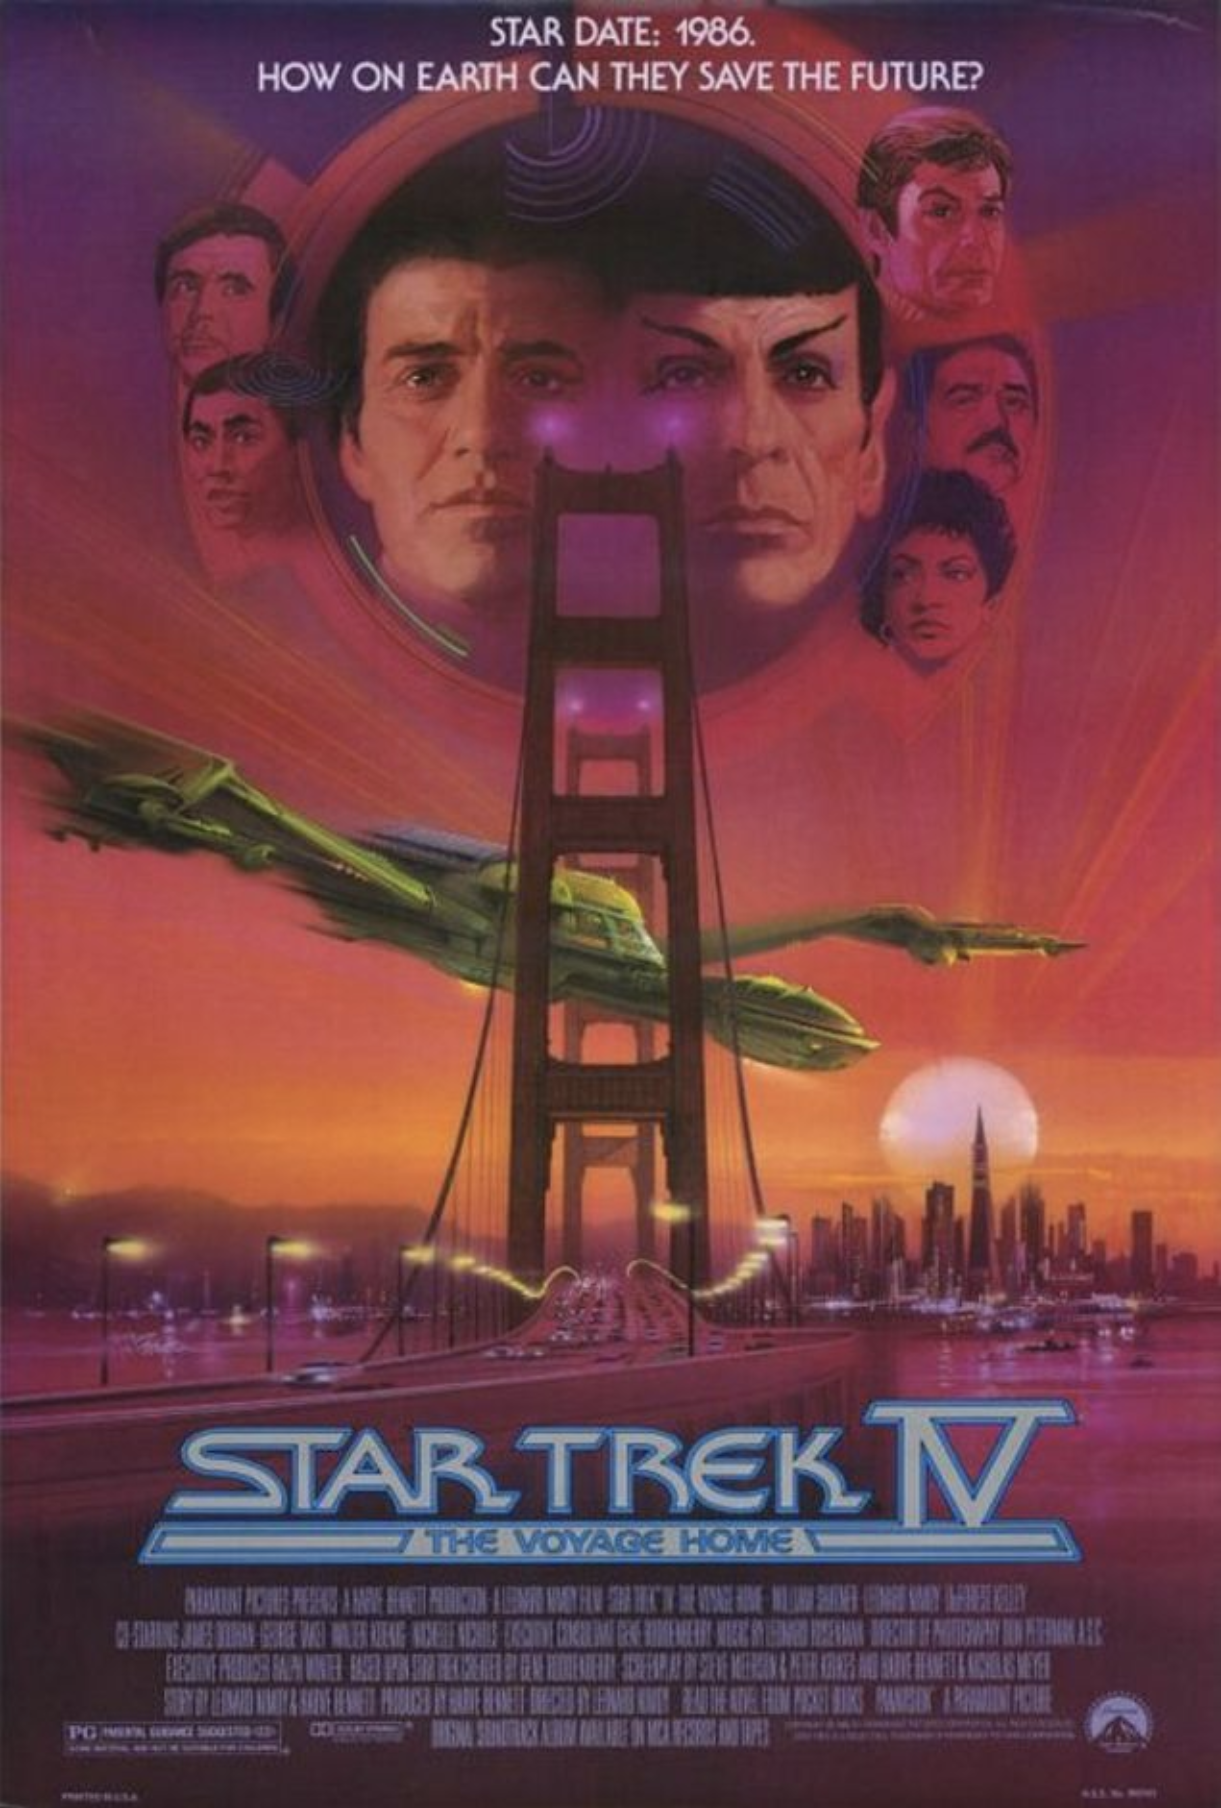 1986 Star Trek lV The Voyage Home writer